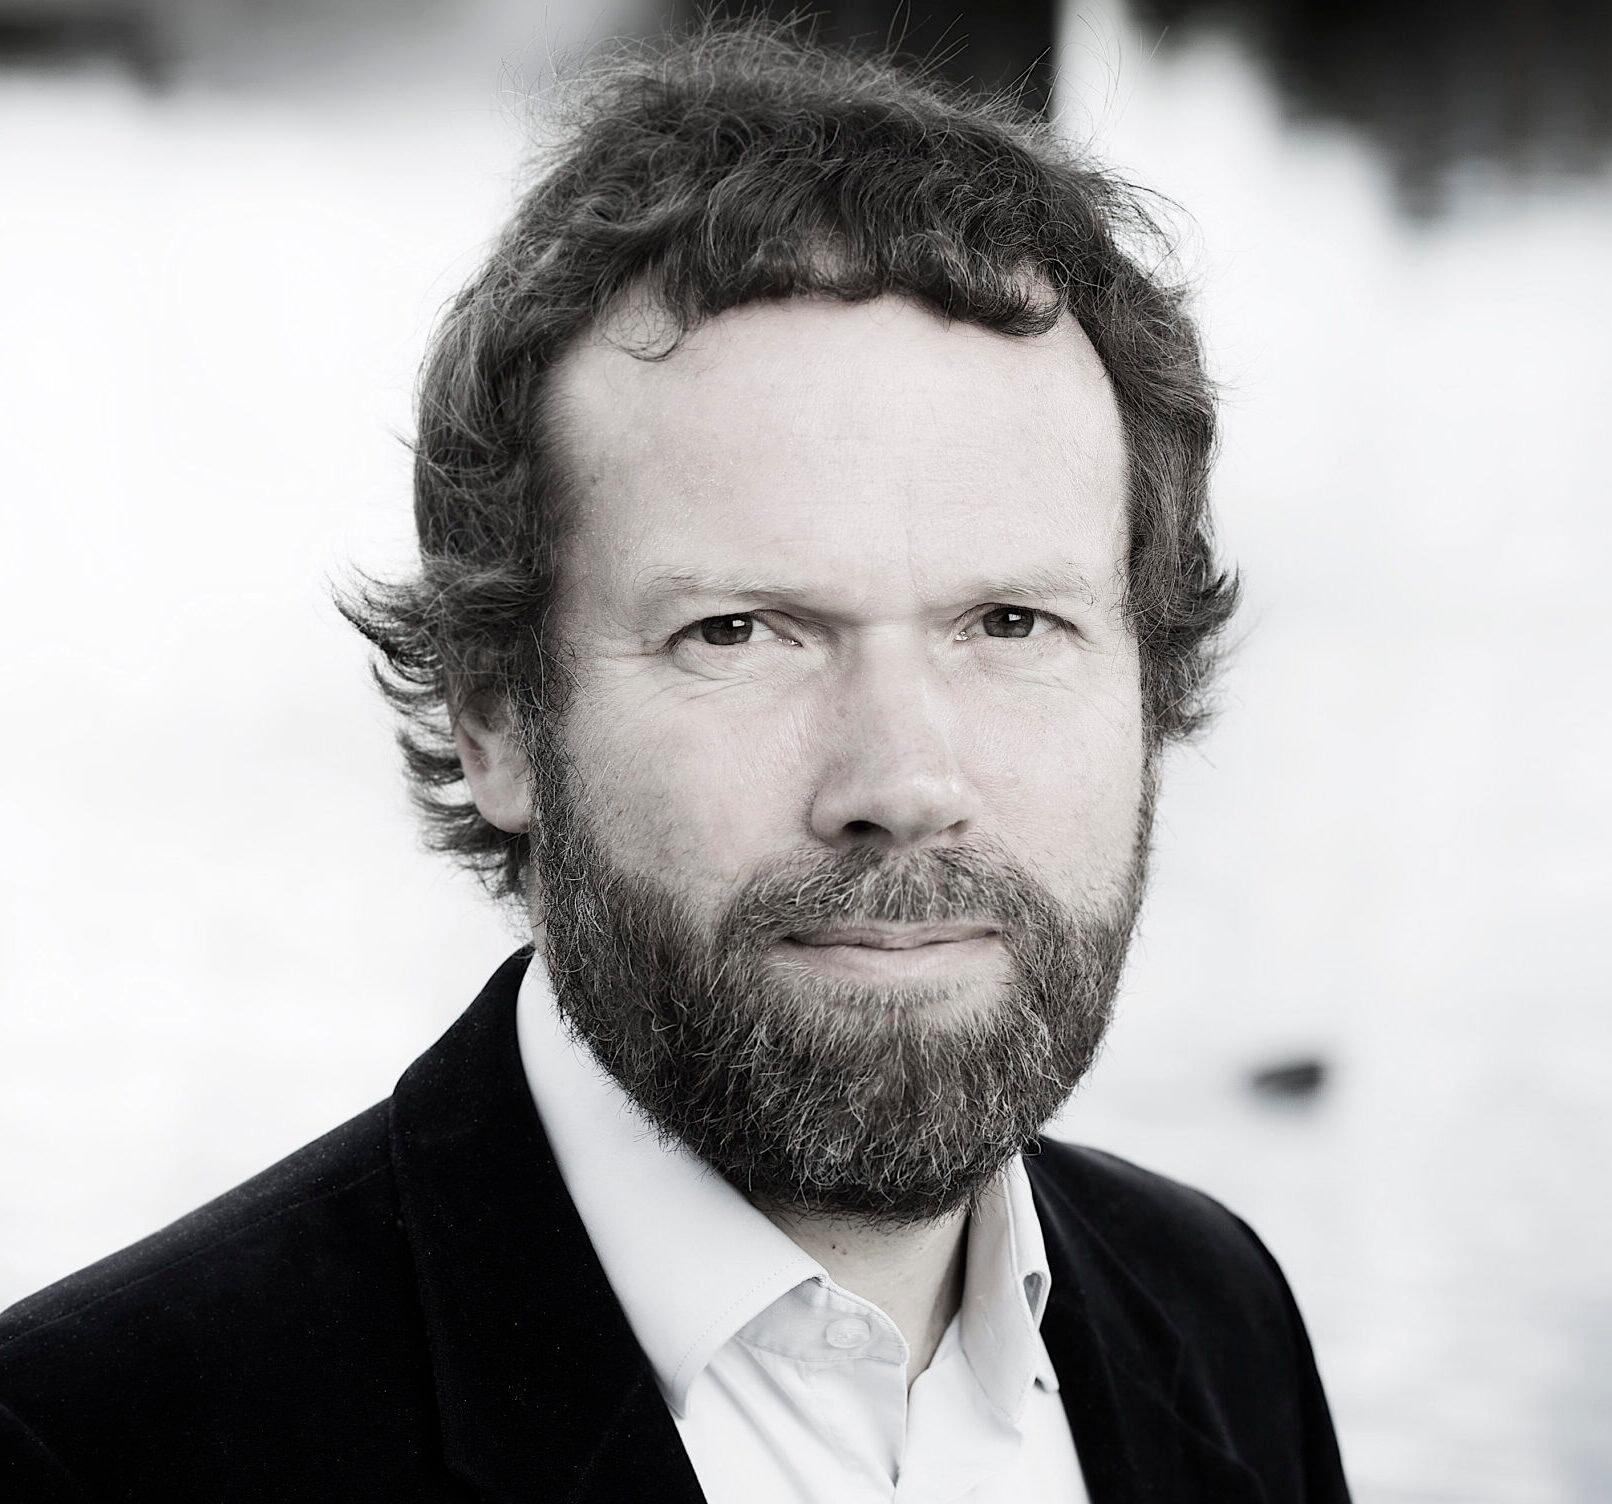 Lars Pehrson